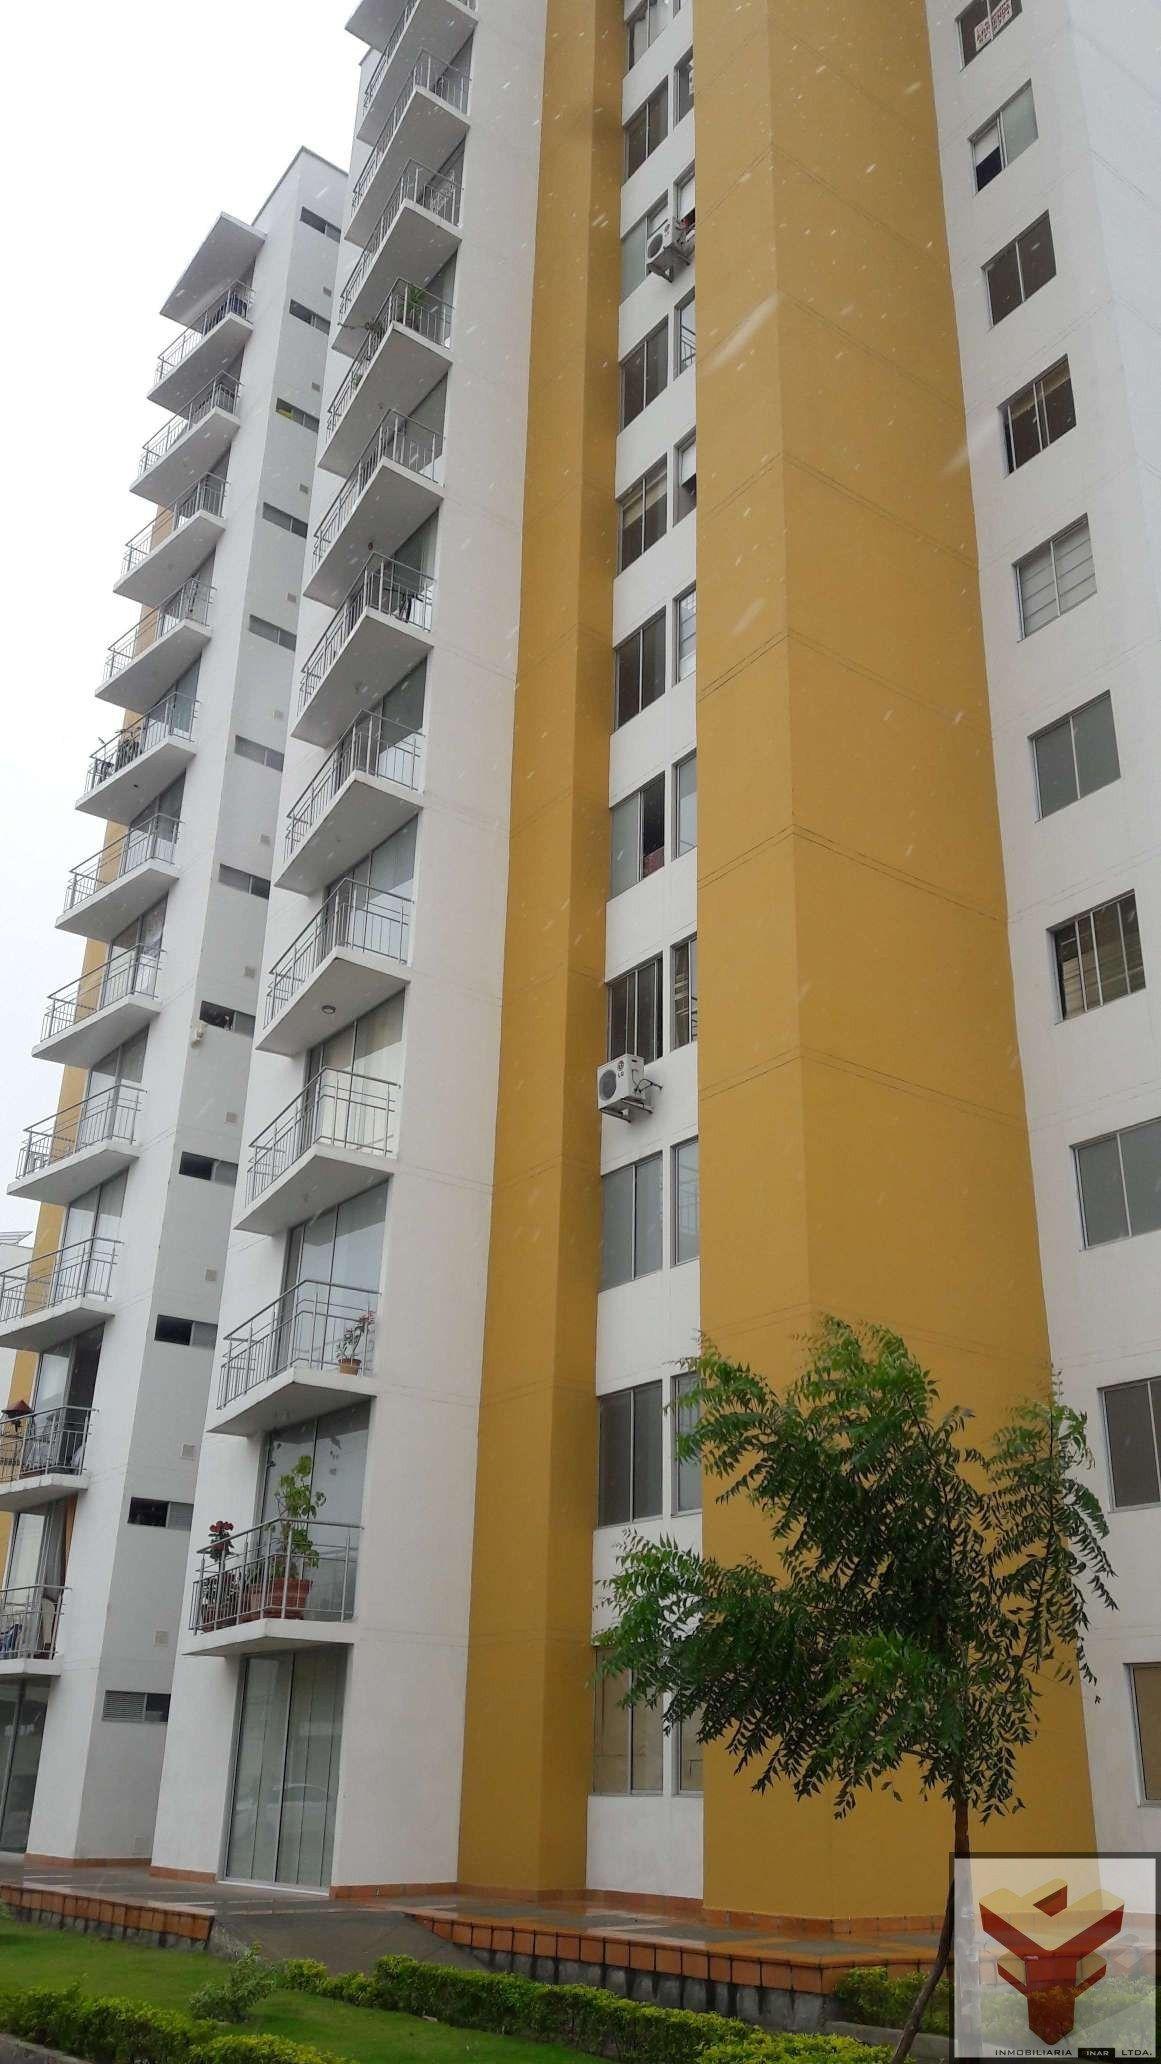 Vendo Apartamento Torre Centenario, Zulima, Cúcuta cod 1693 - http://www.inmobiliariafinar.com/vendo-apartamento-torre-centenario-zulima-cucuta-cod-1693/